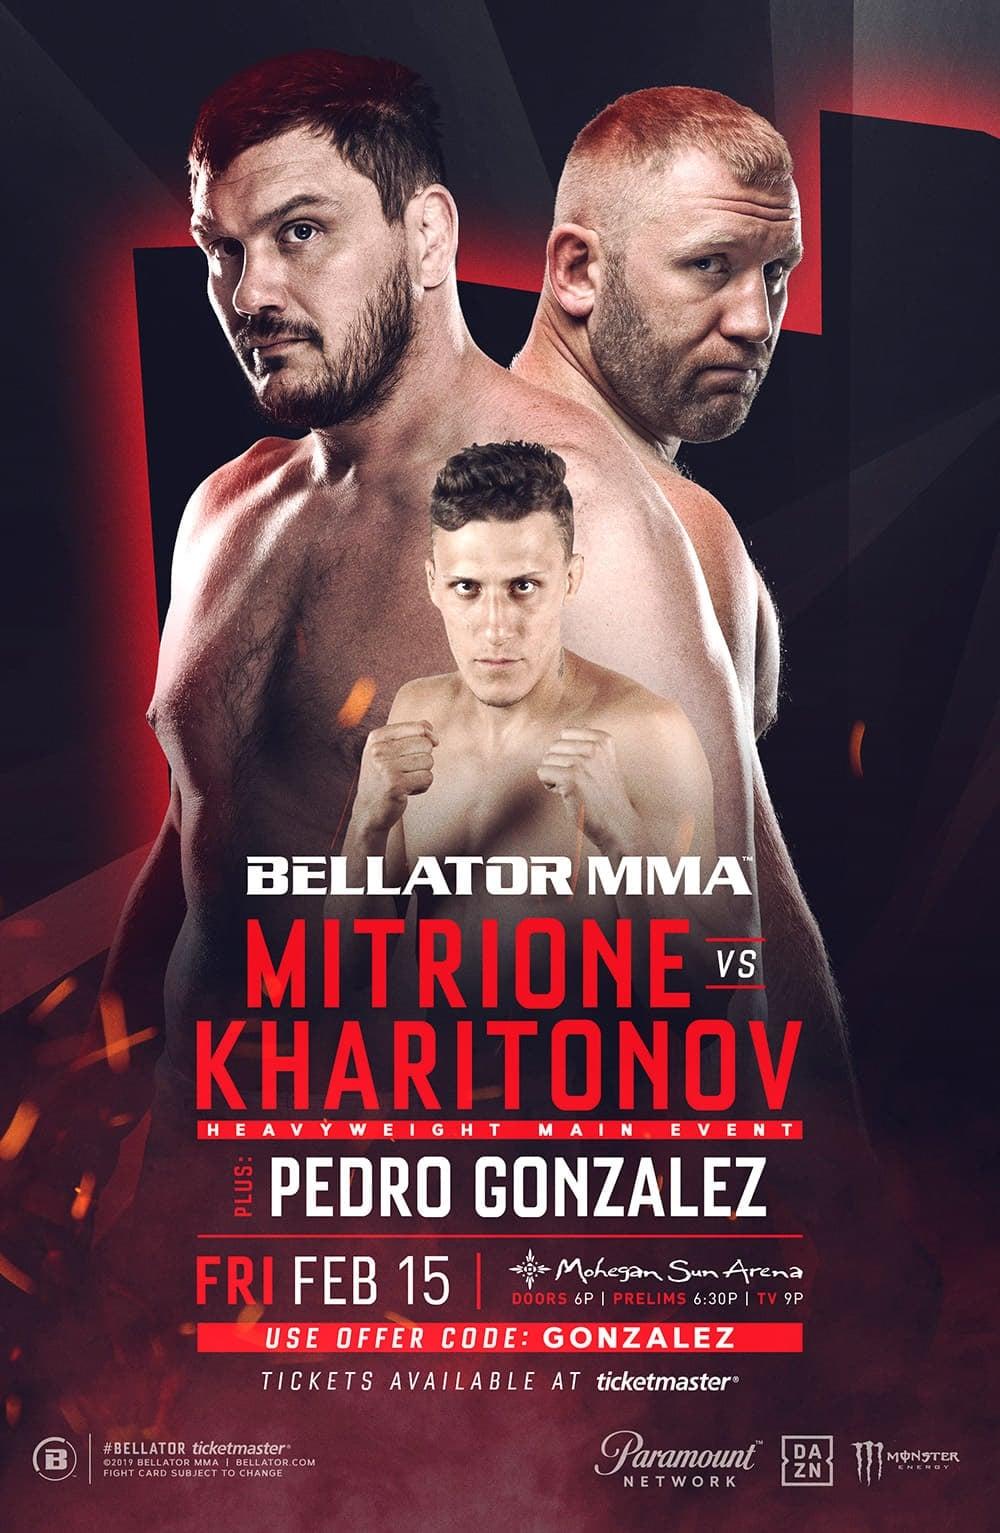 Bellator 215: Mitrione vs. Kharitonov